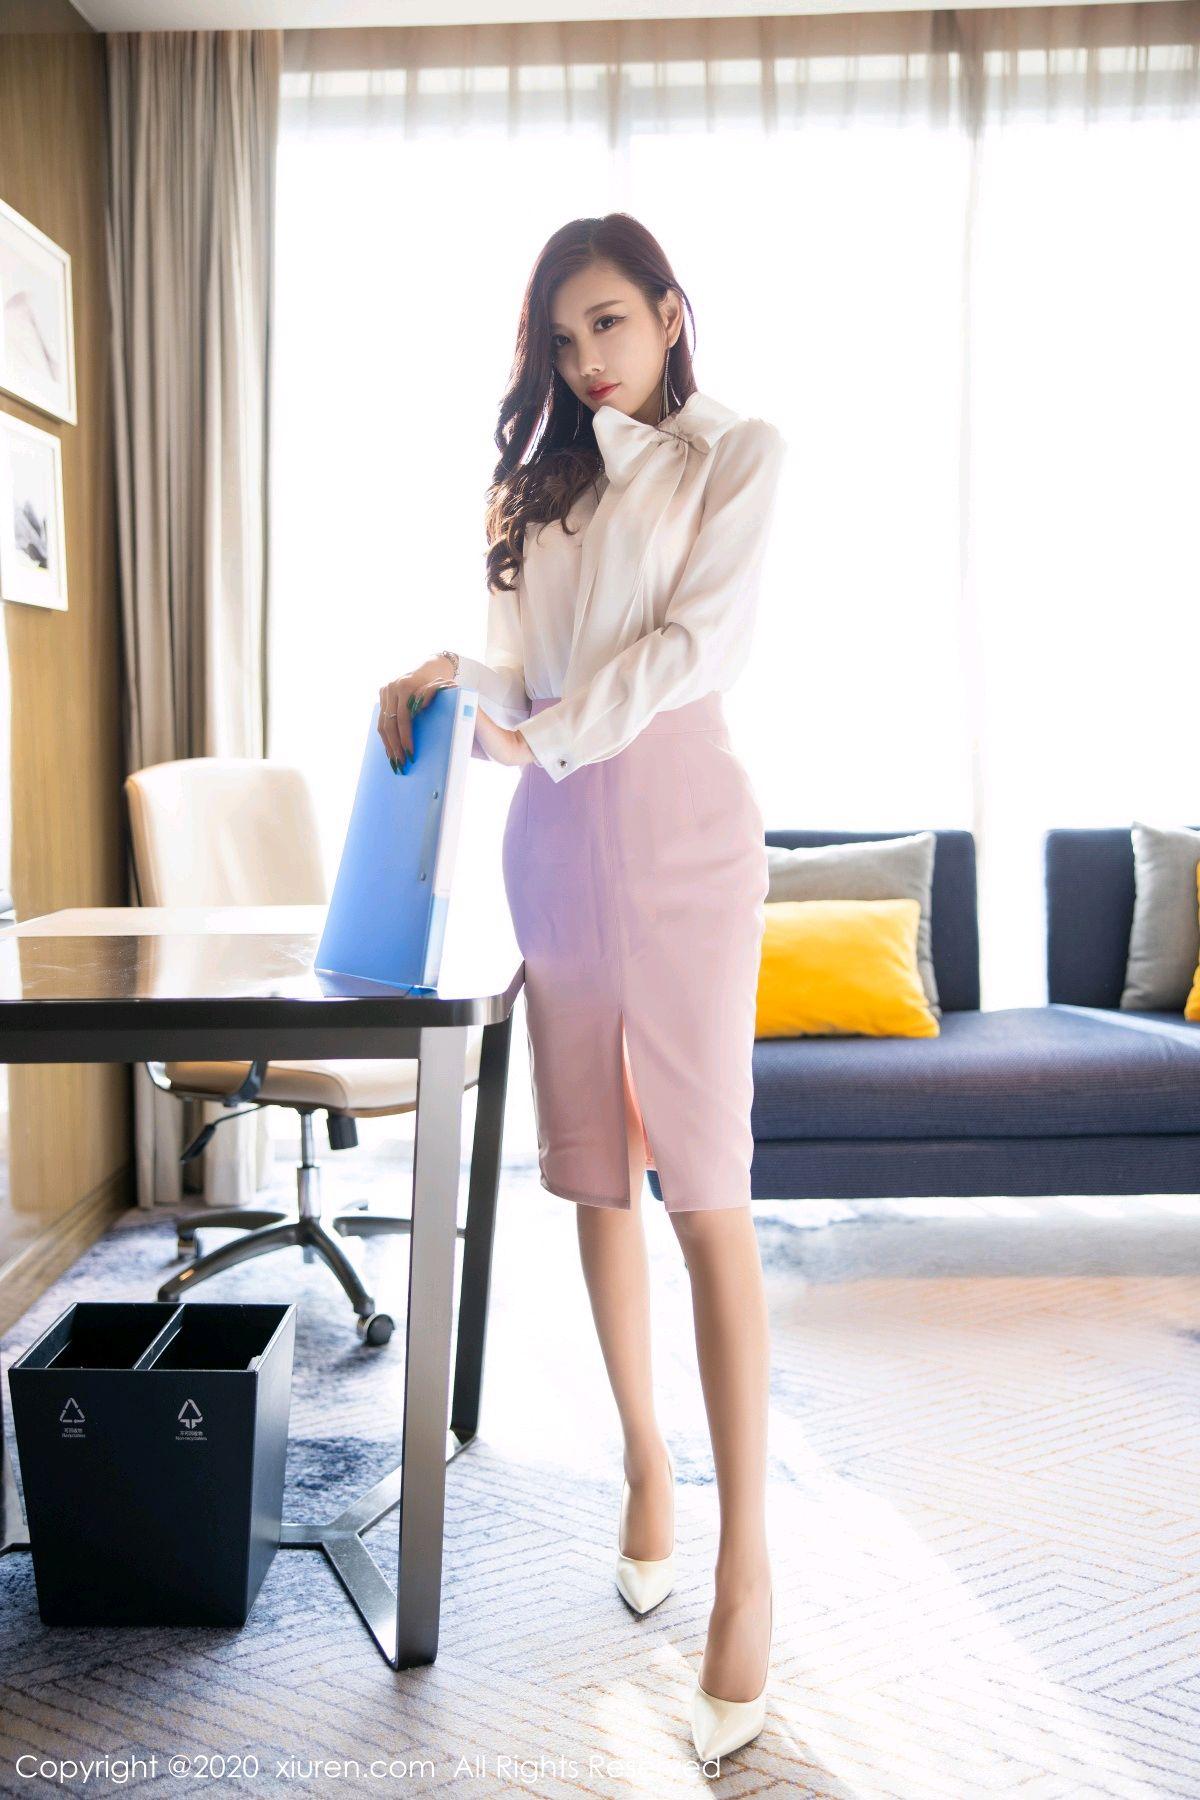 [XiuRen] Vol.2431 Yang Chen Chen 2P, Tall, Underwear, Uniform, Xiuren, Yang Chen Chen